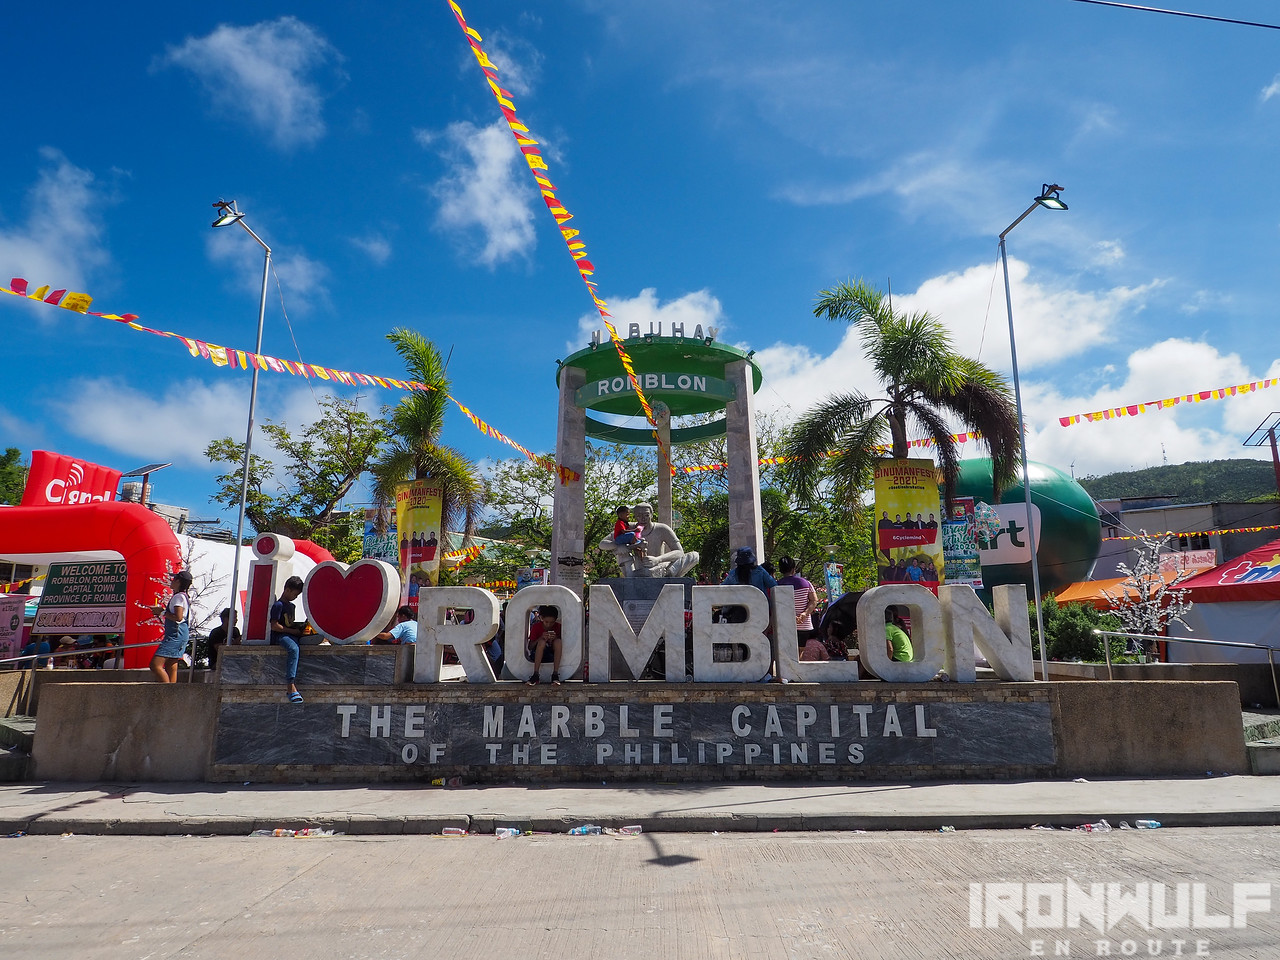 Romblon Freedom Plaza